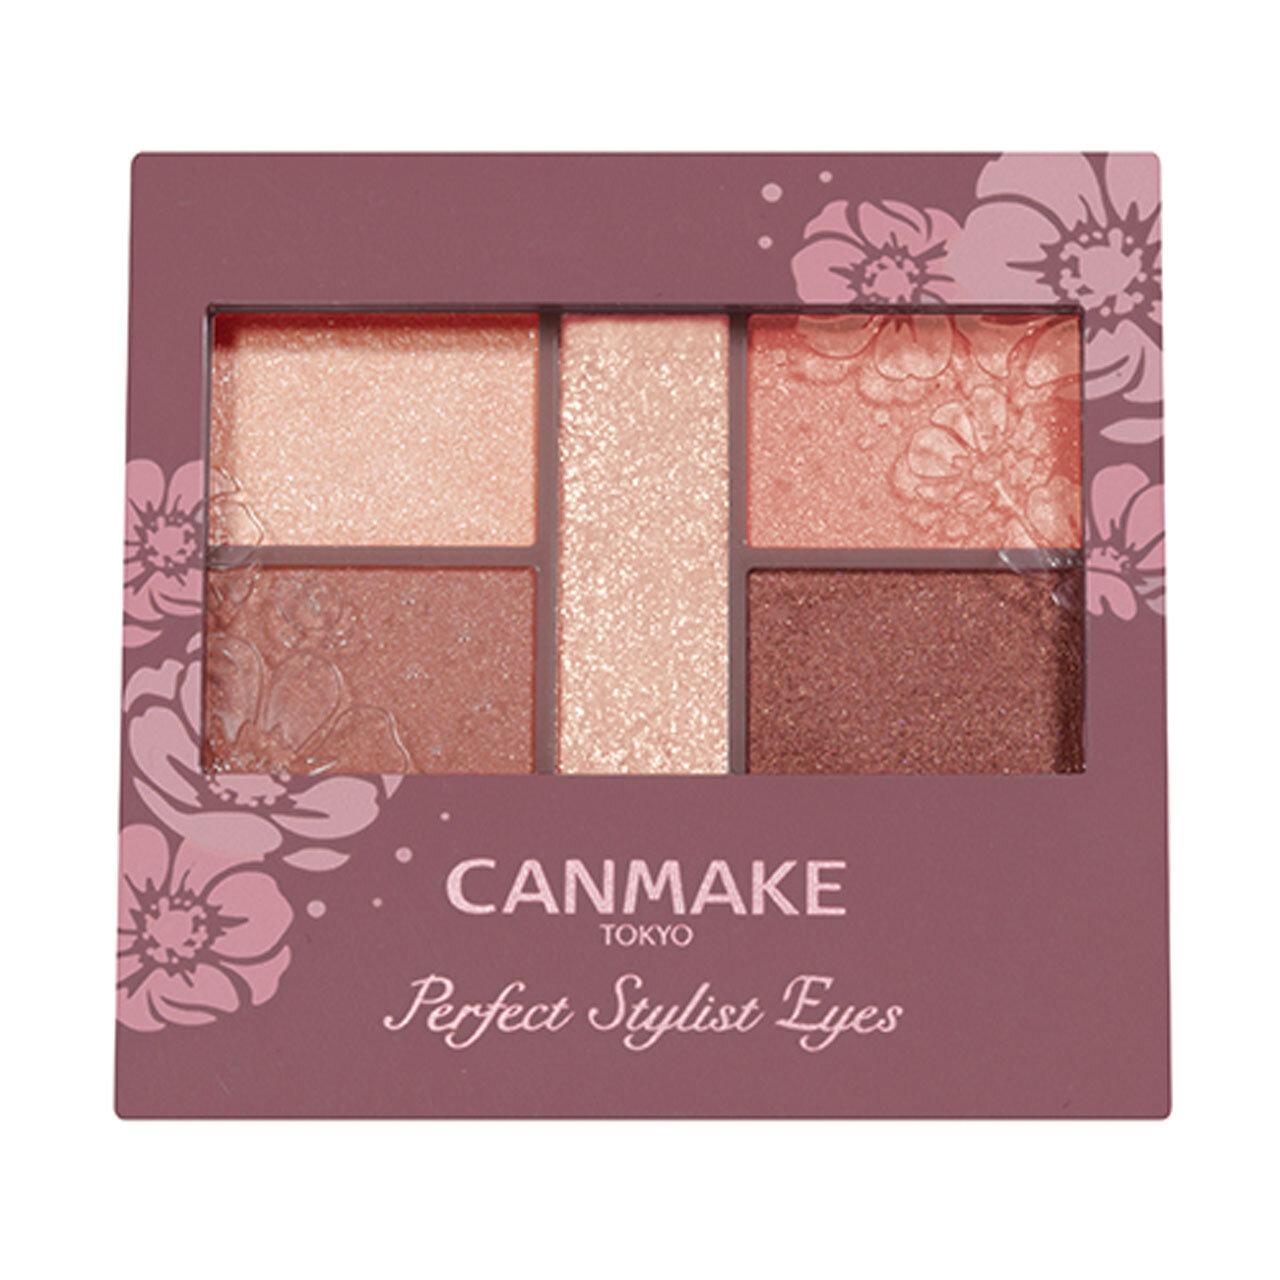 CANMAKE(キャンメイク)『パーフェクトスタイリストアイズ』